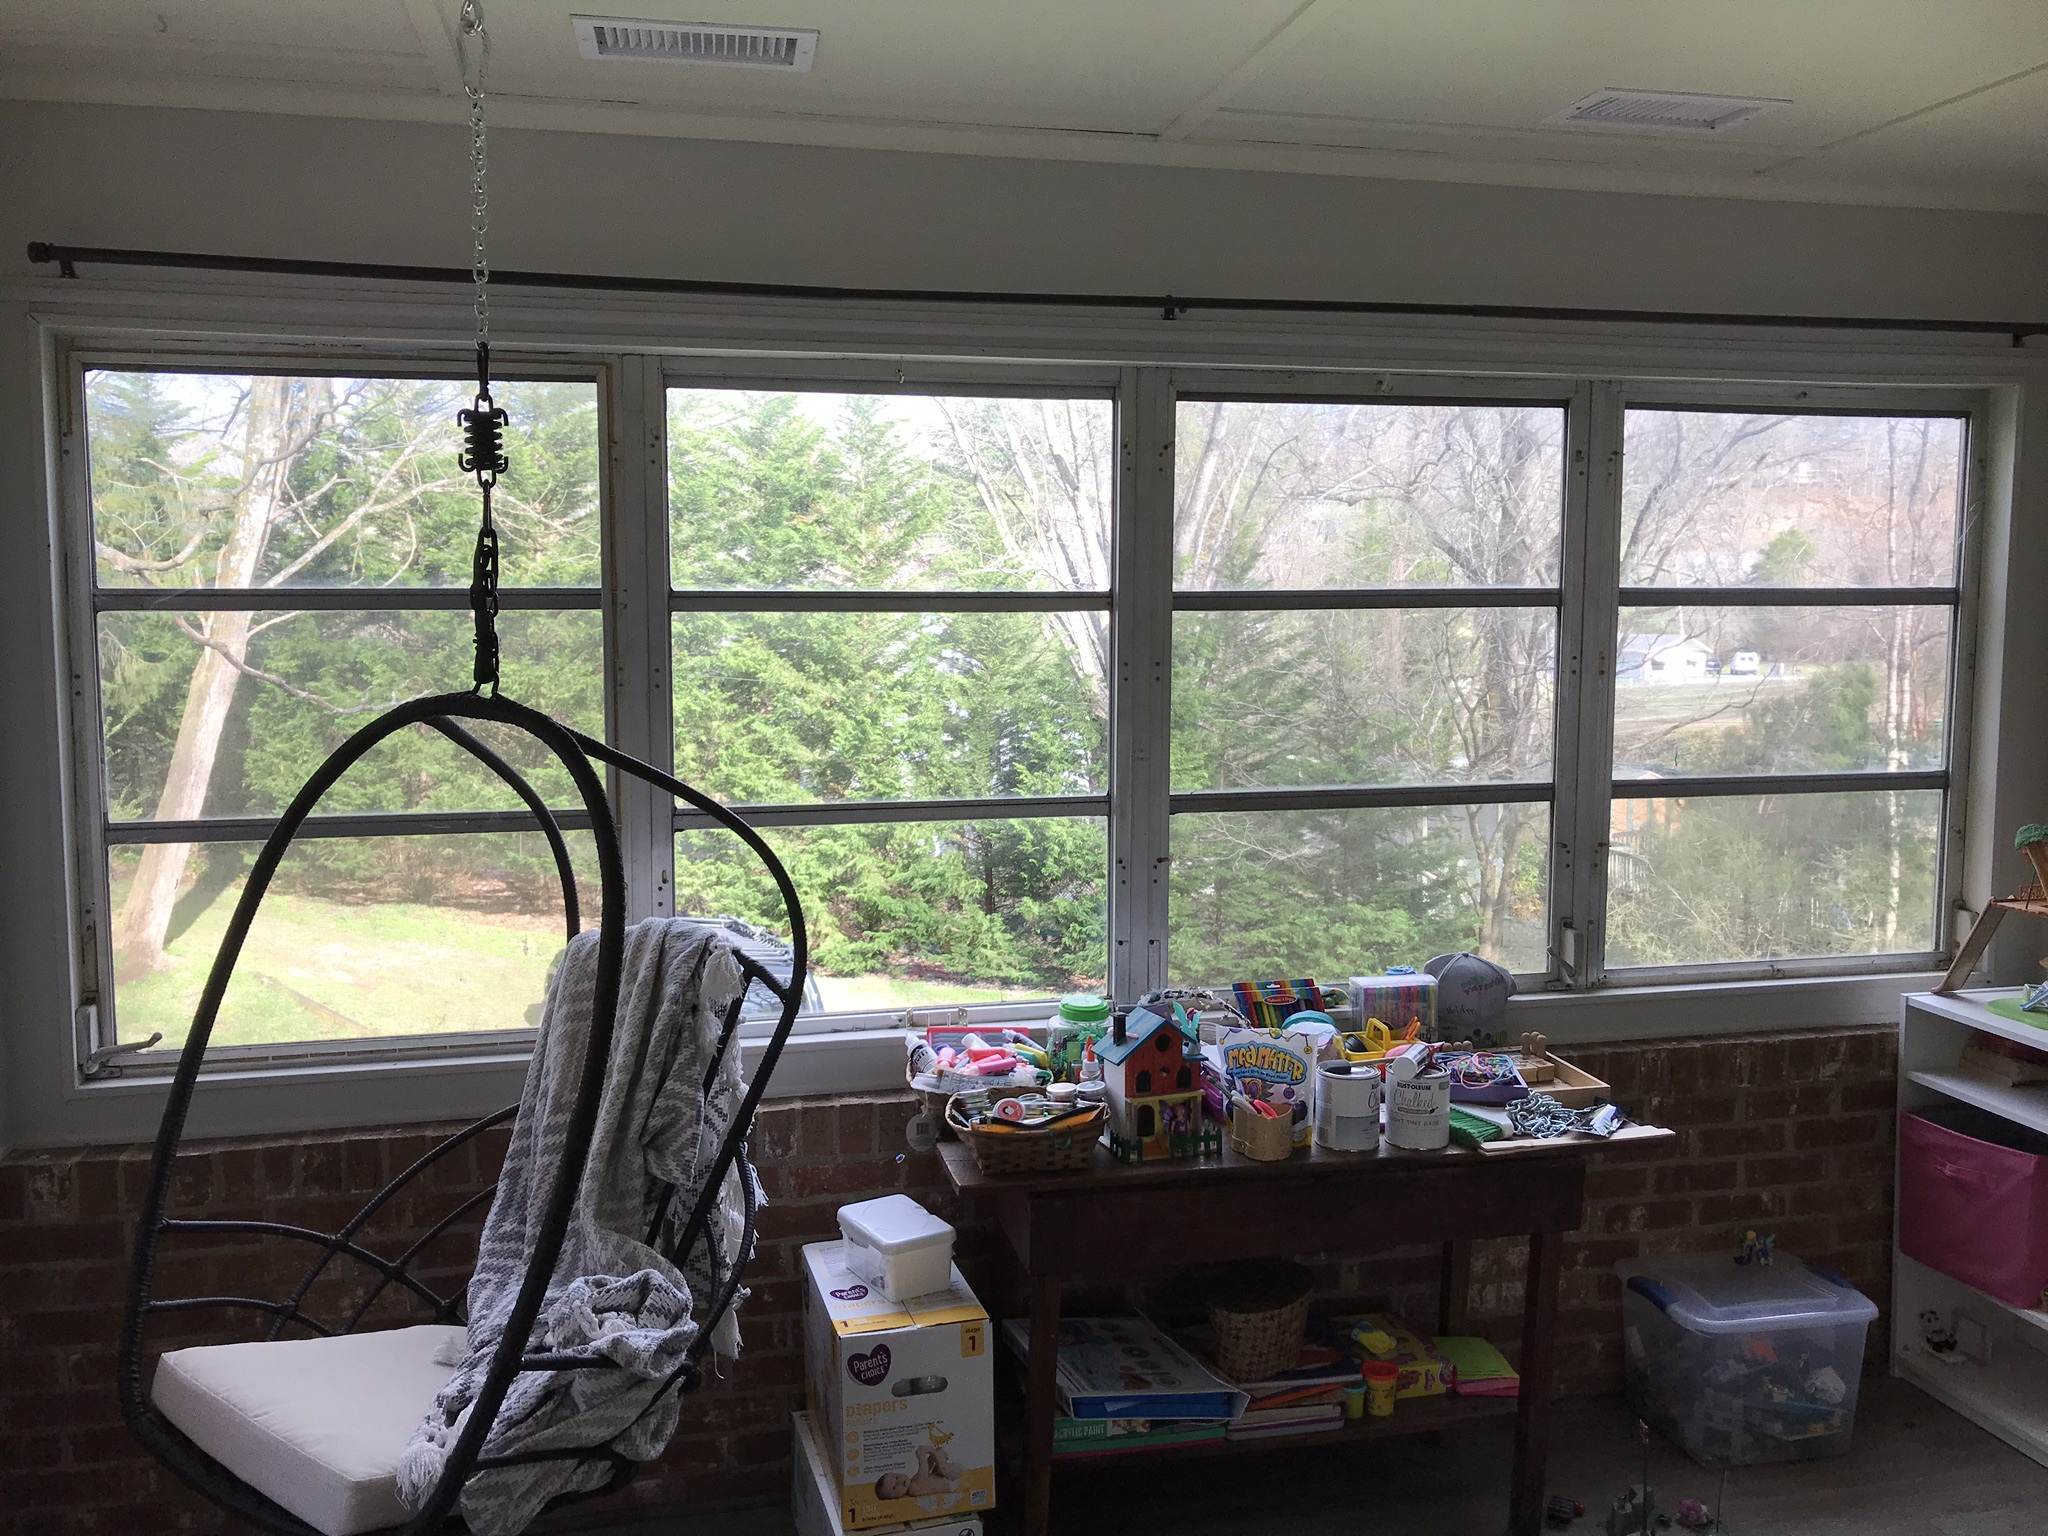 Window & Door Install in Older Home _HELP Please-694c668b-ec0c-4c53-8a8b-9aade32bcae9.jpeg